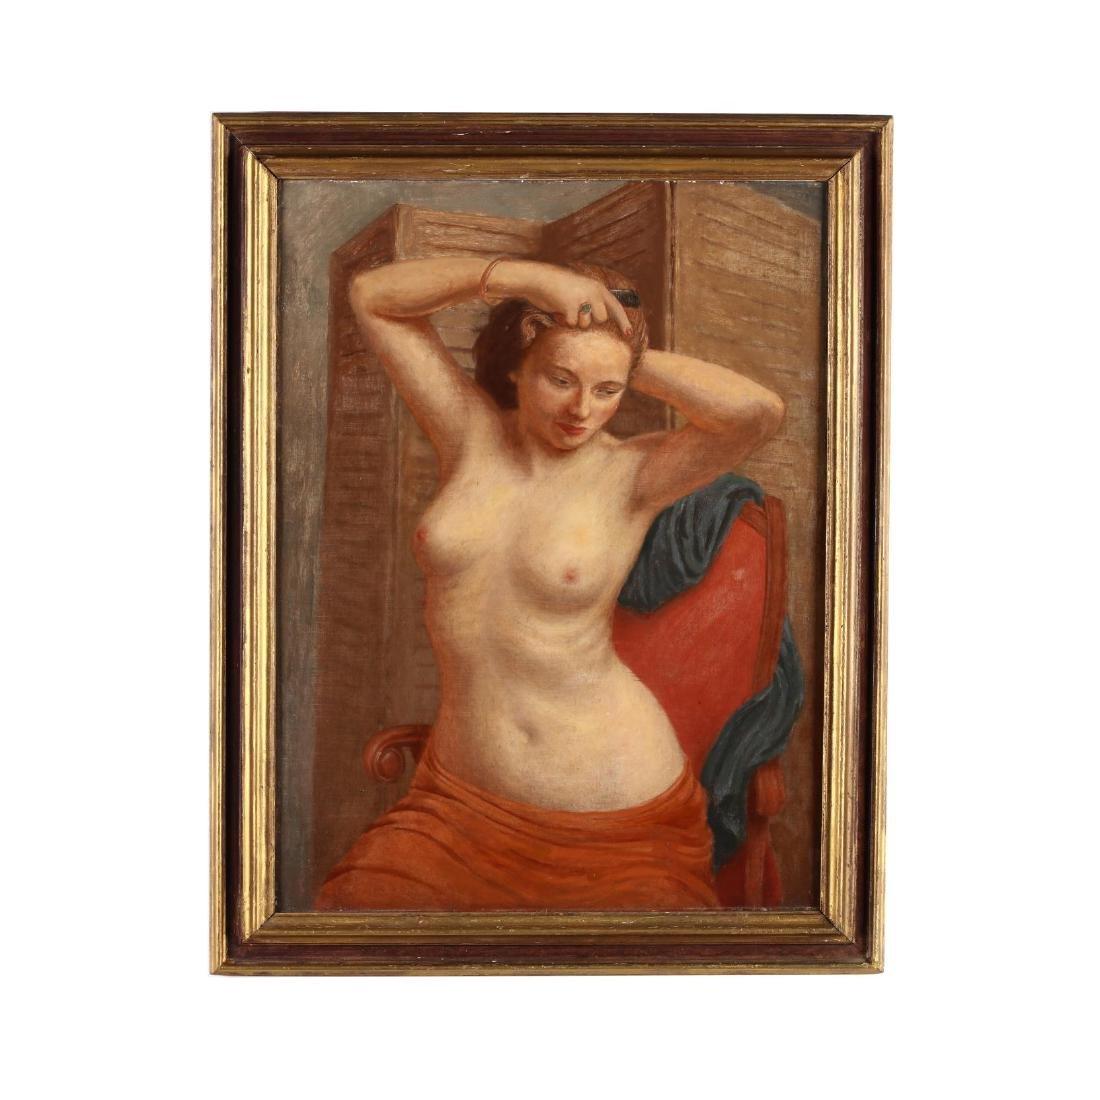 Douglas Gorsline (NY, 1913-1985), Female Nude